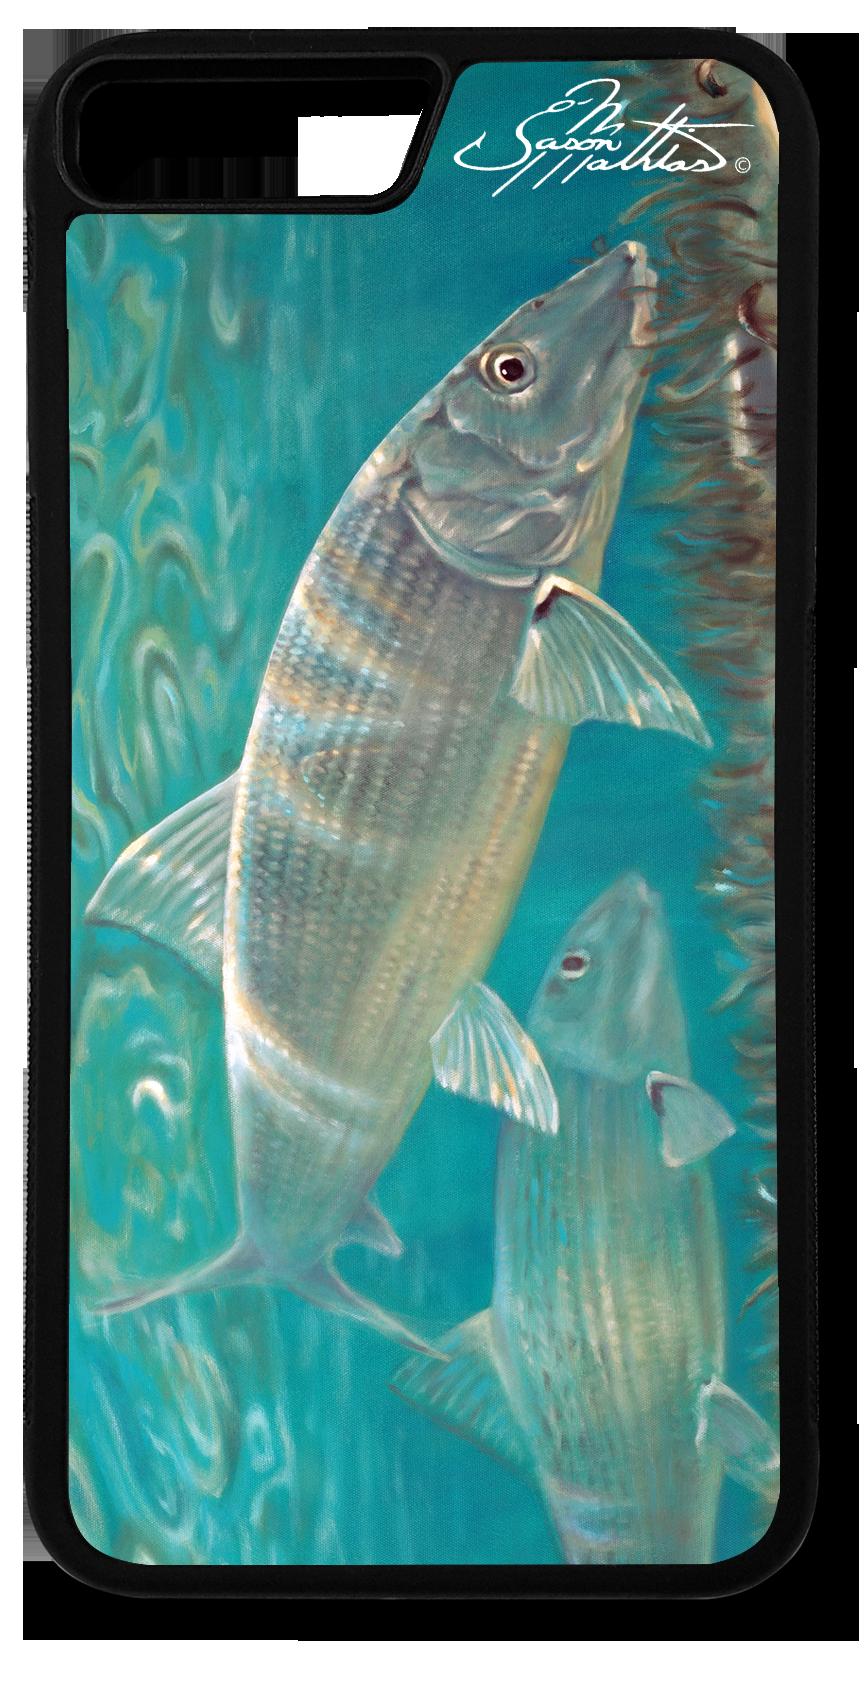 iphone-8-plus-case-bonefish-2-jason-mathias-art-copy.png